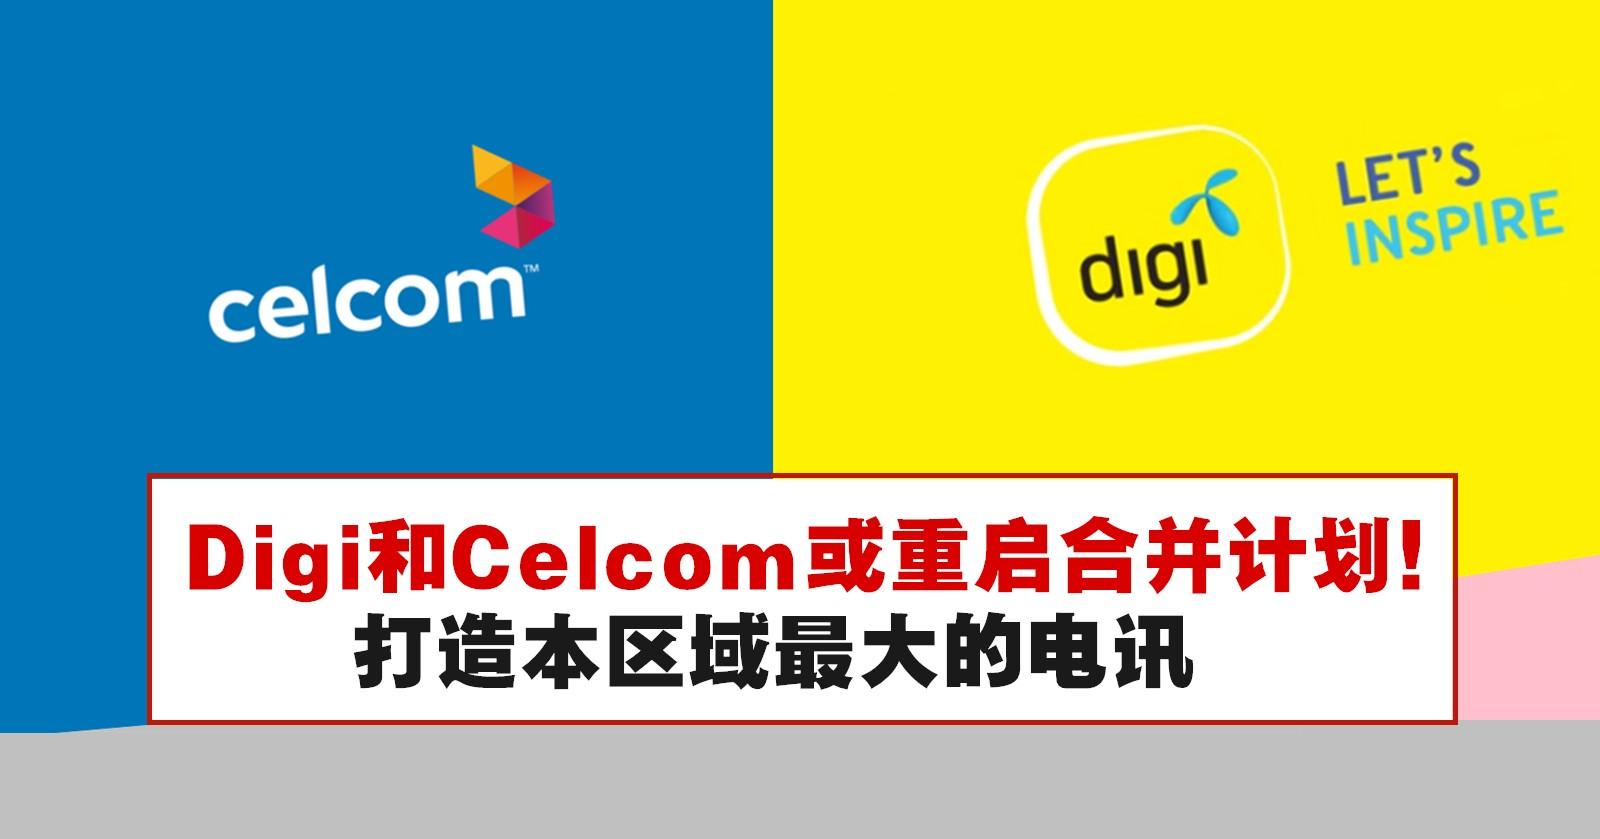 Digi和Celcom可能会重启合并计划!